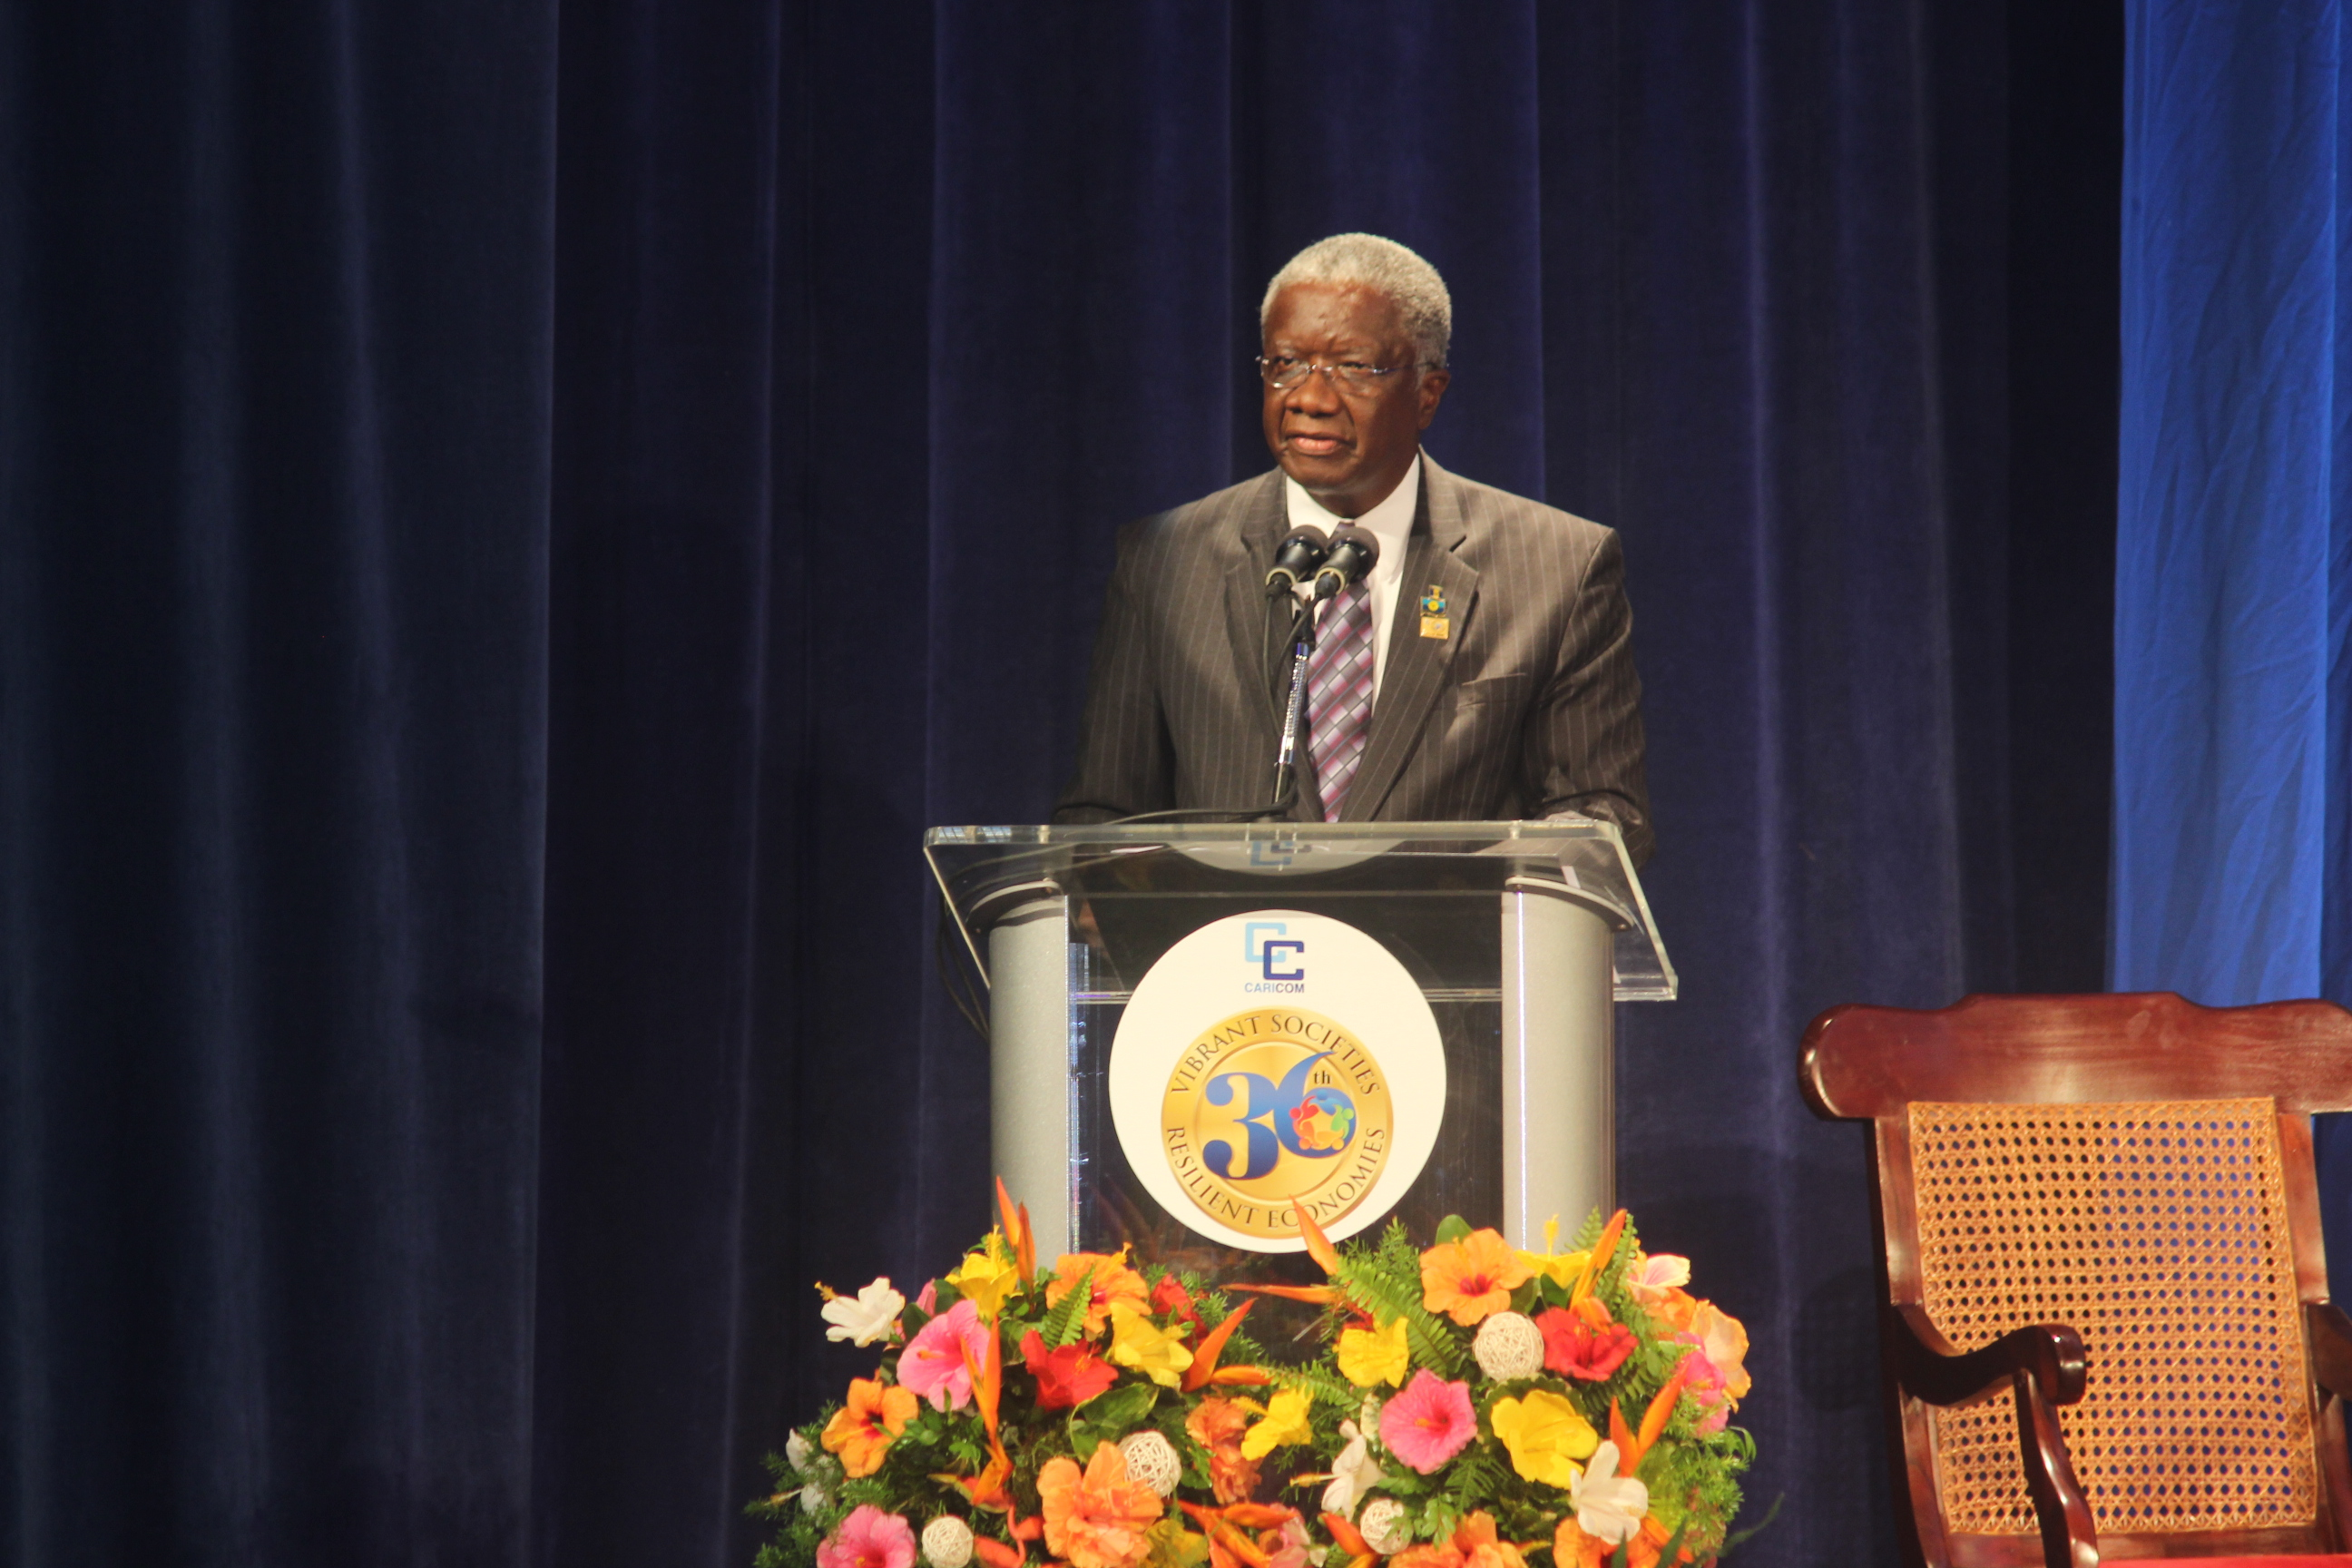 Chairman of CARICOM the Rt. Hon. Freundel Stuart